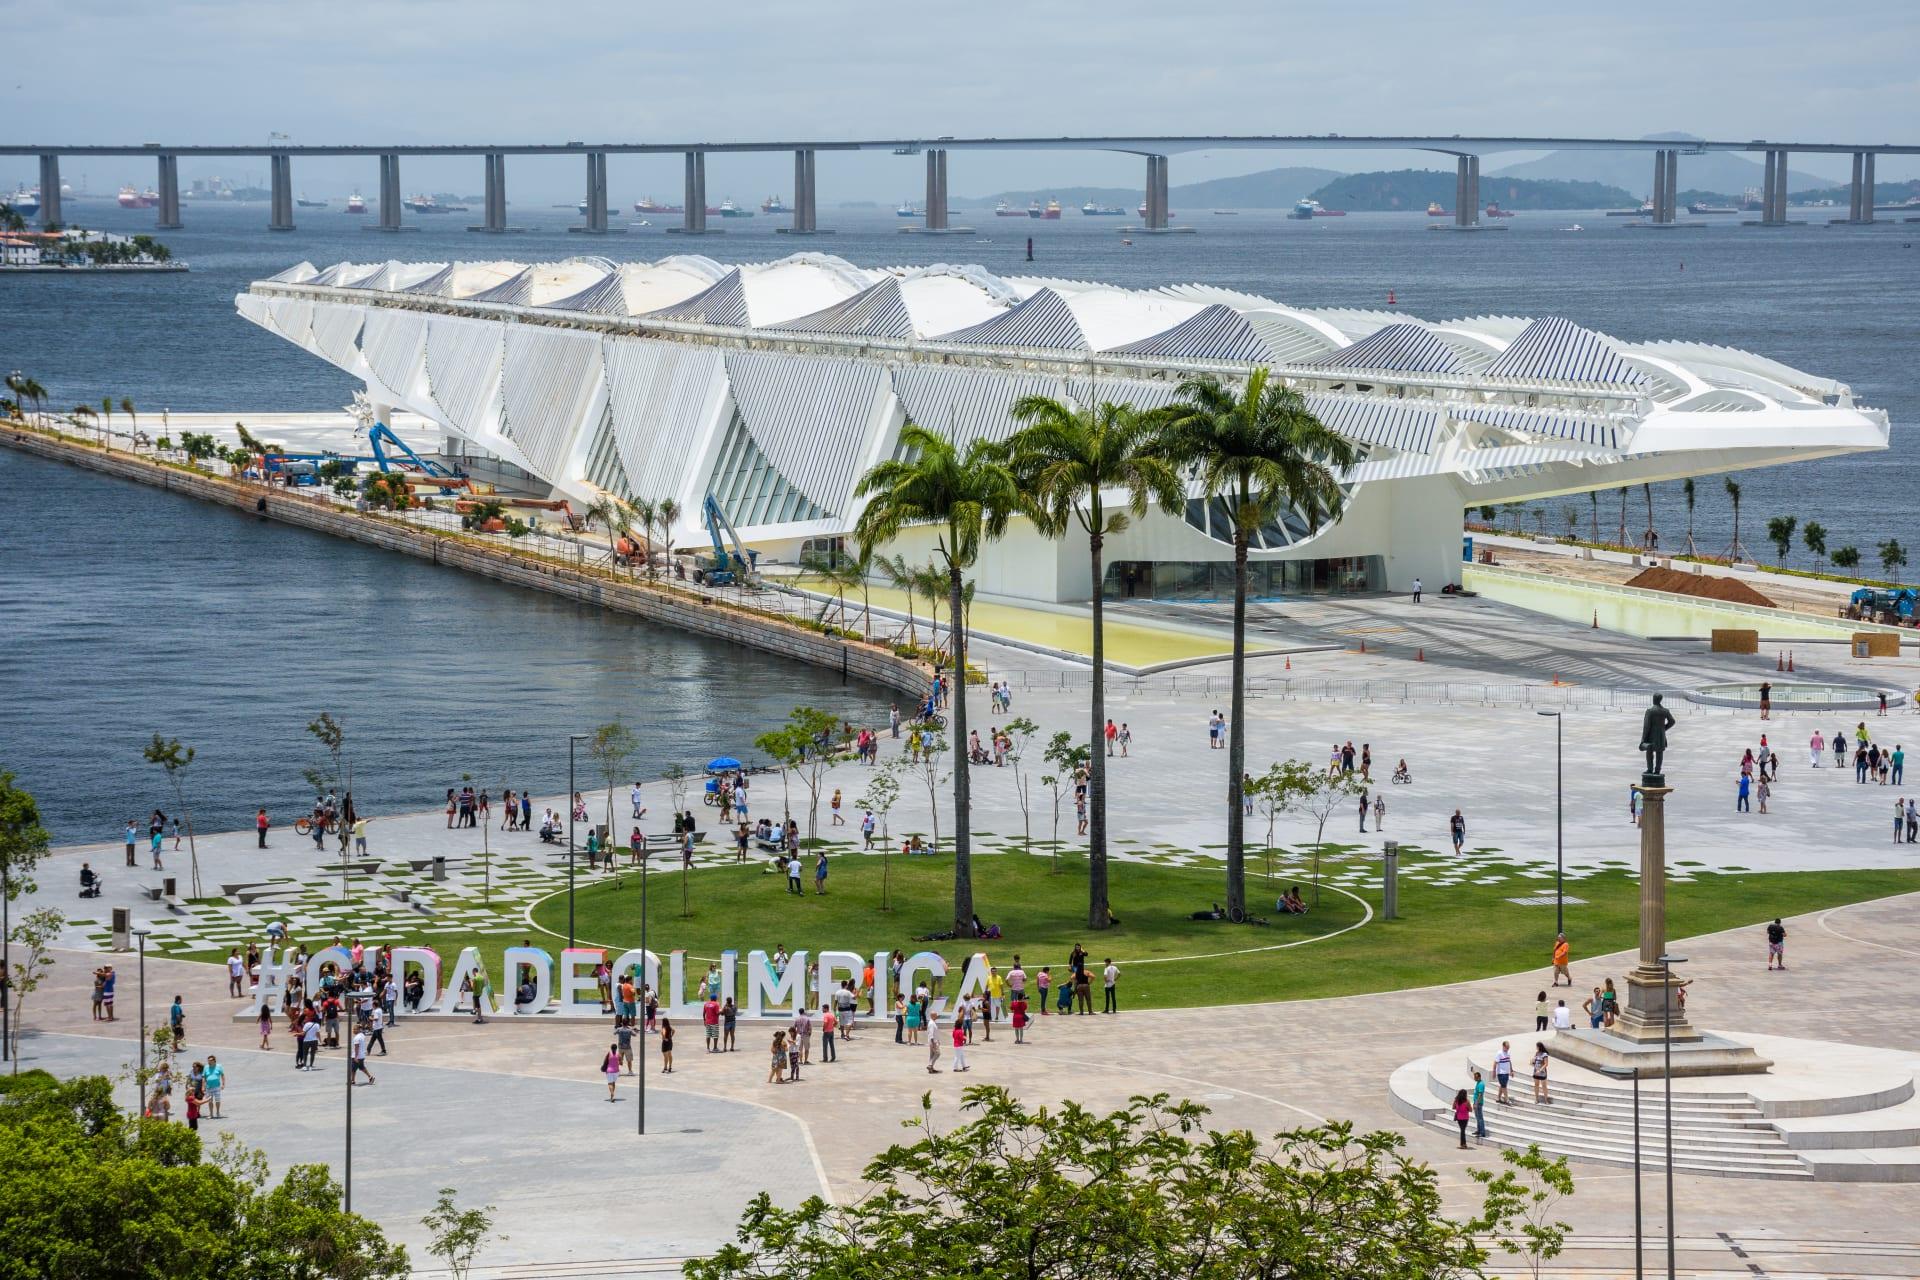 Rio de Janeiro - Marvelous Port – Street Art and Architecture – UNESCO World Capital of Architecture